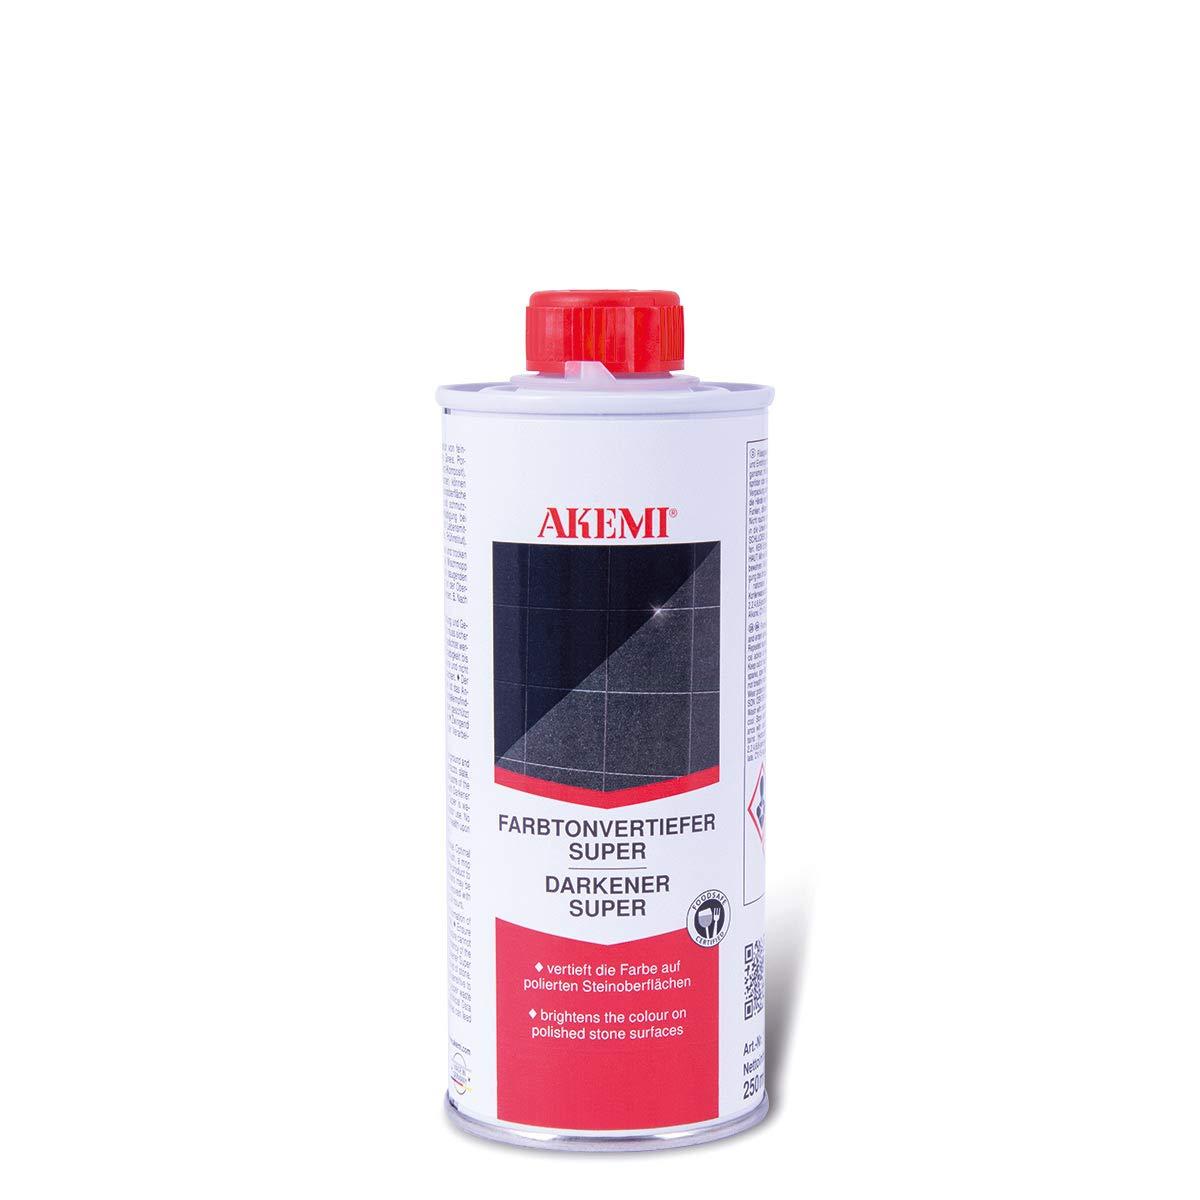 Akemi Darkener Super - 250 ml by Akemi